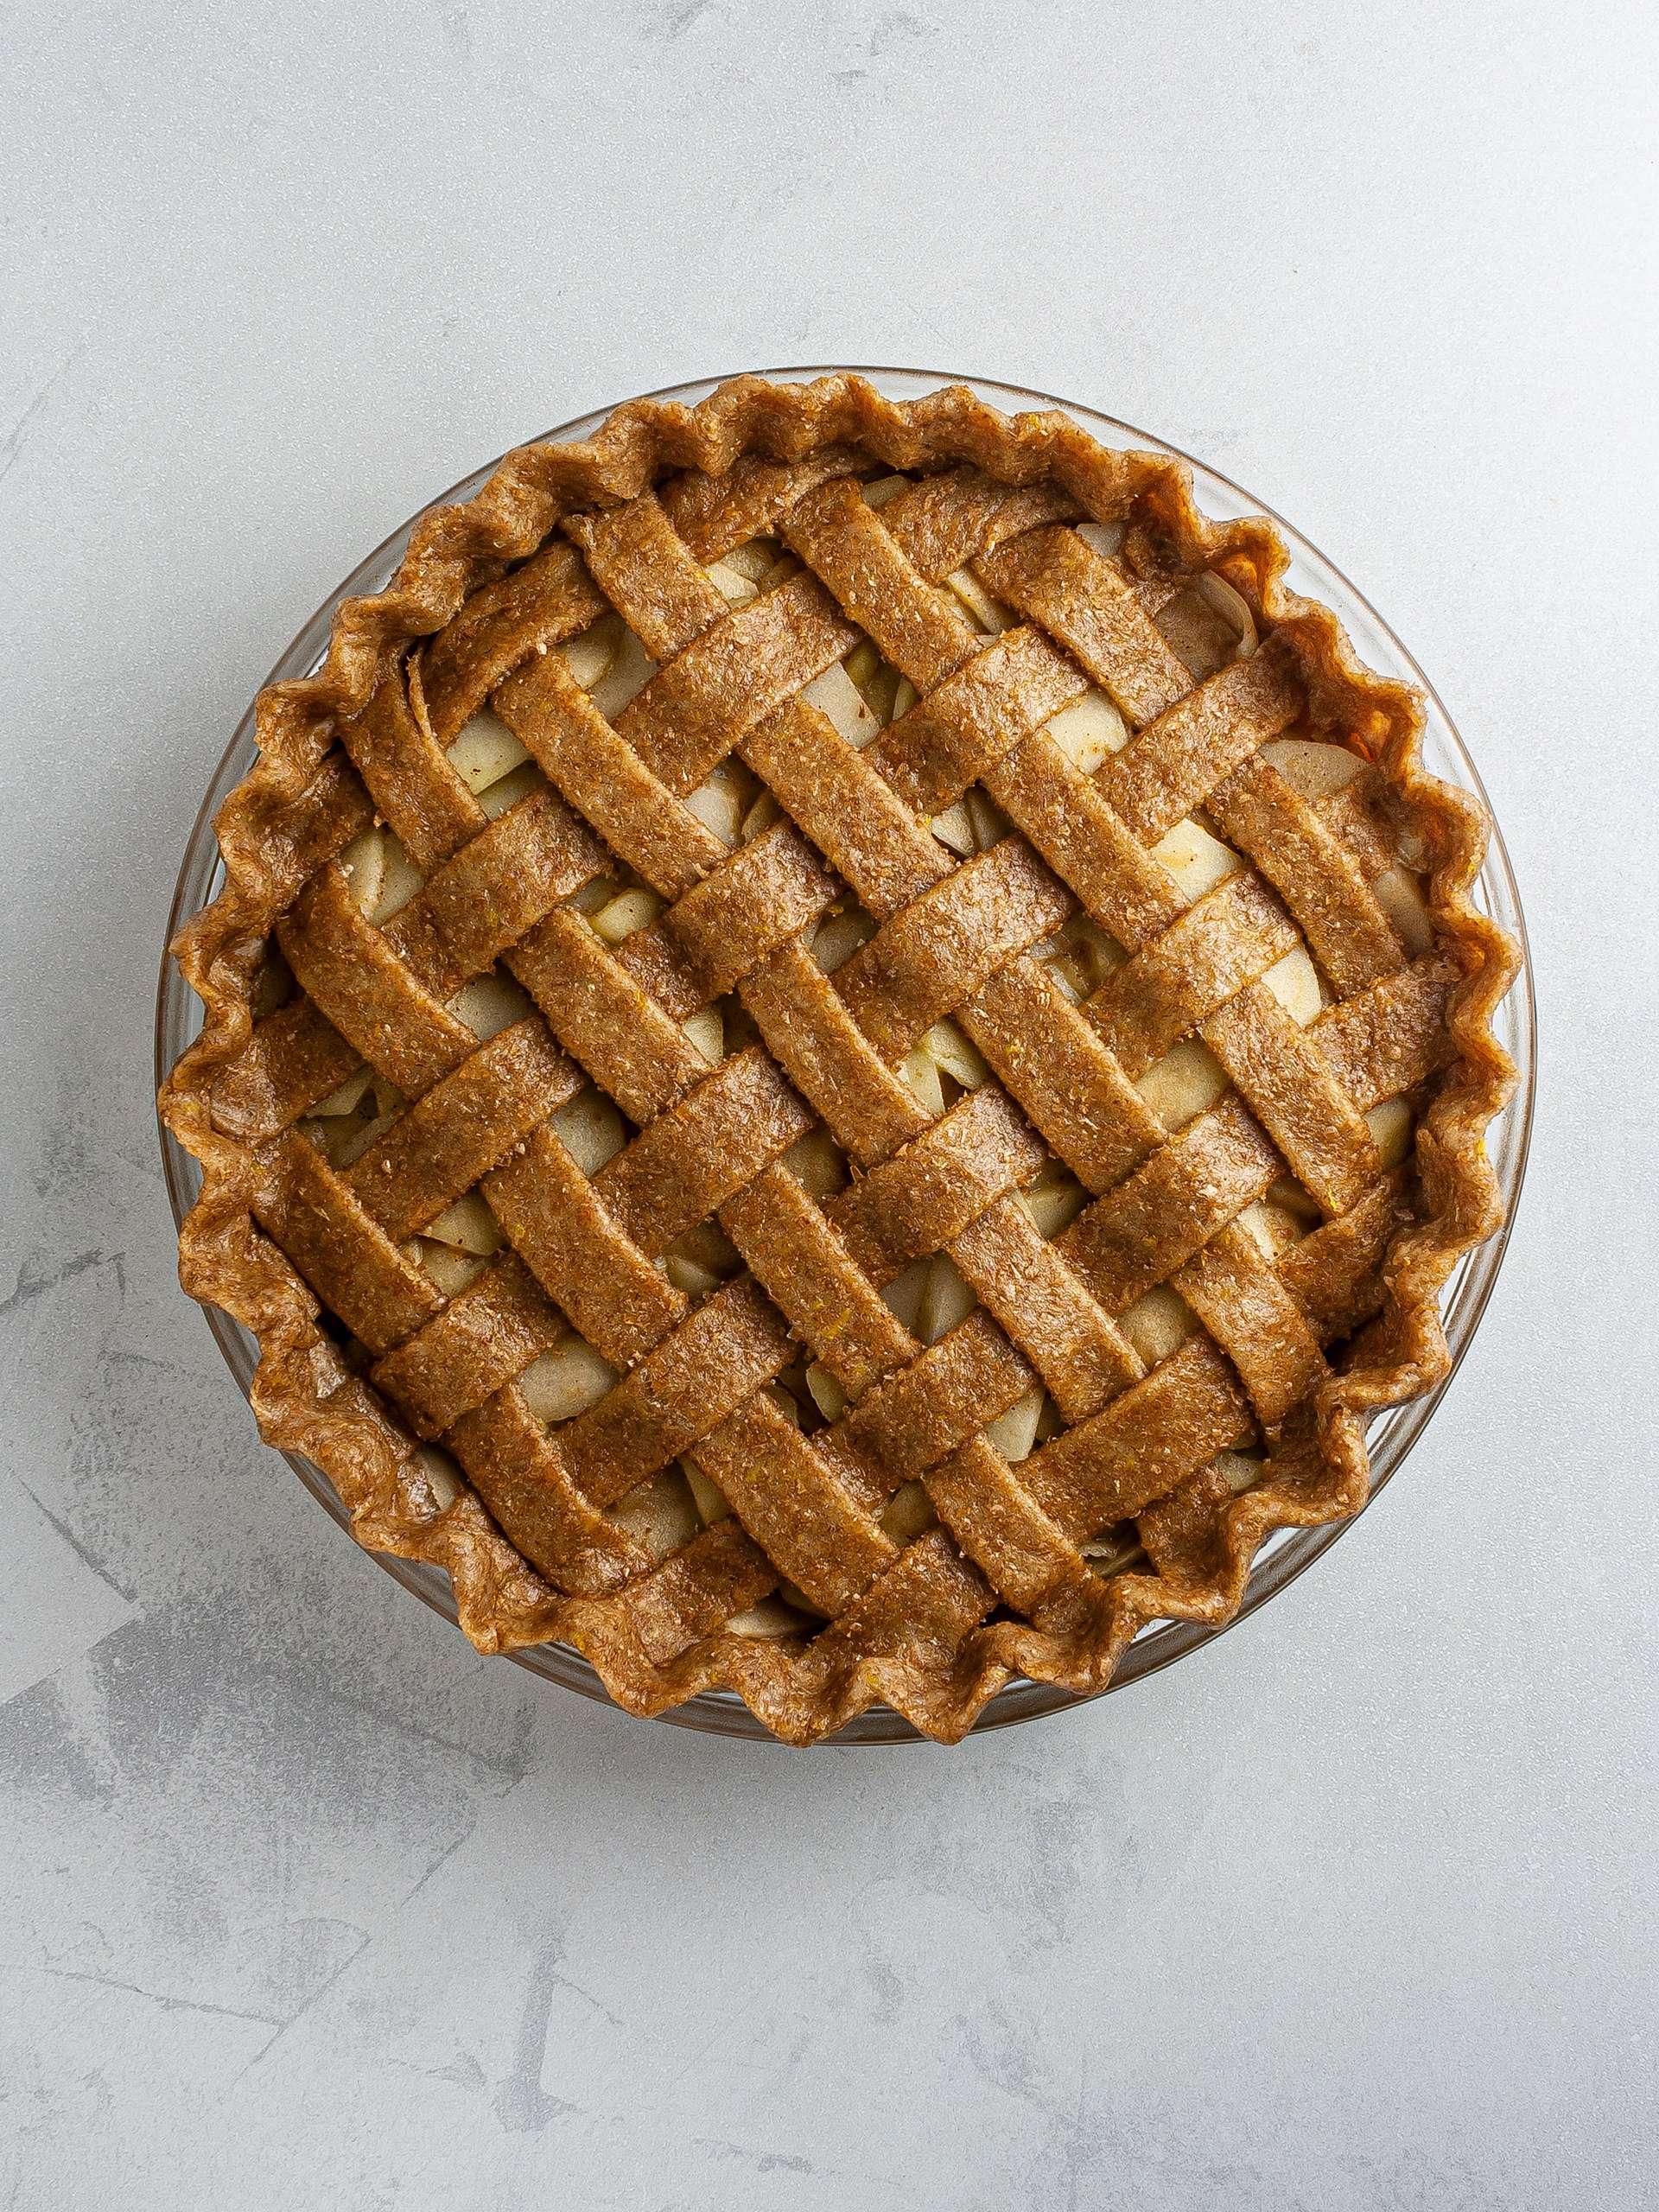 Apple pie with woven lattice crust